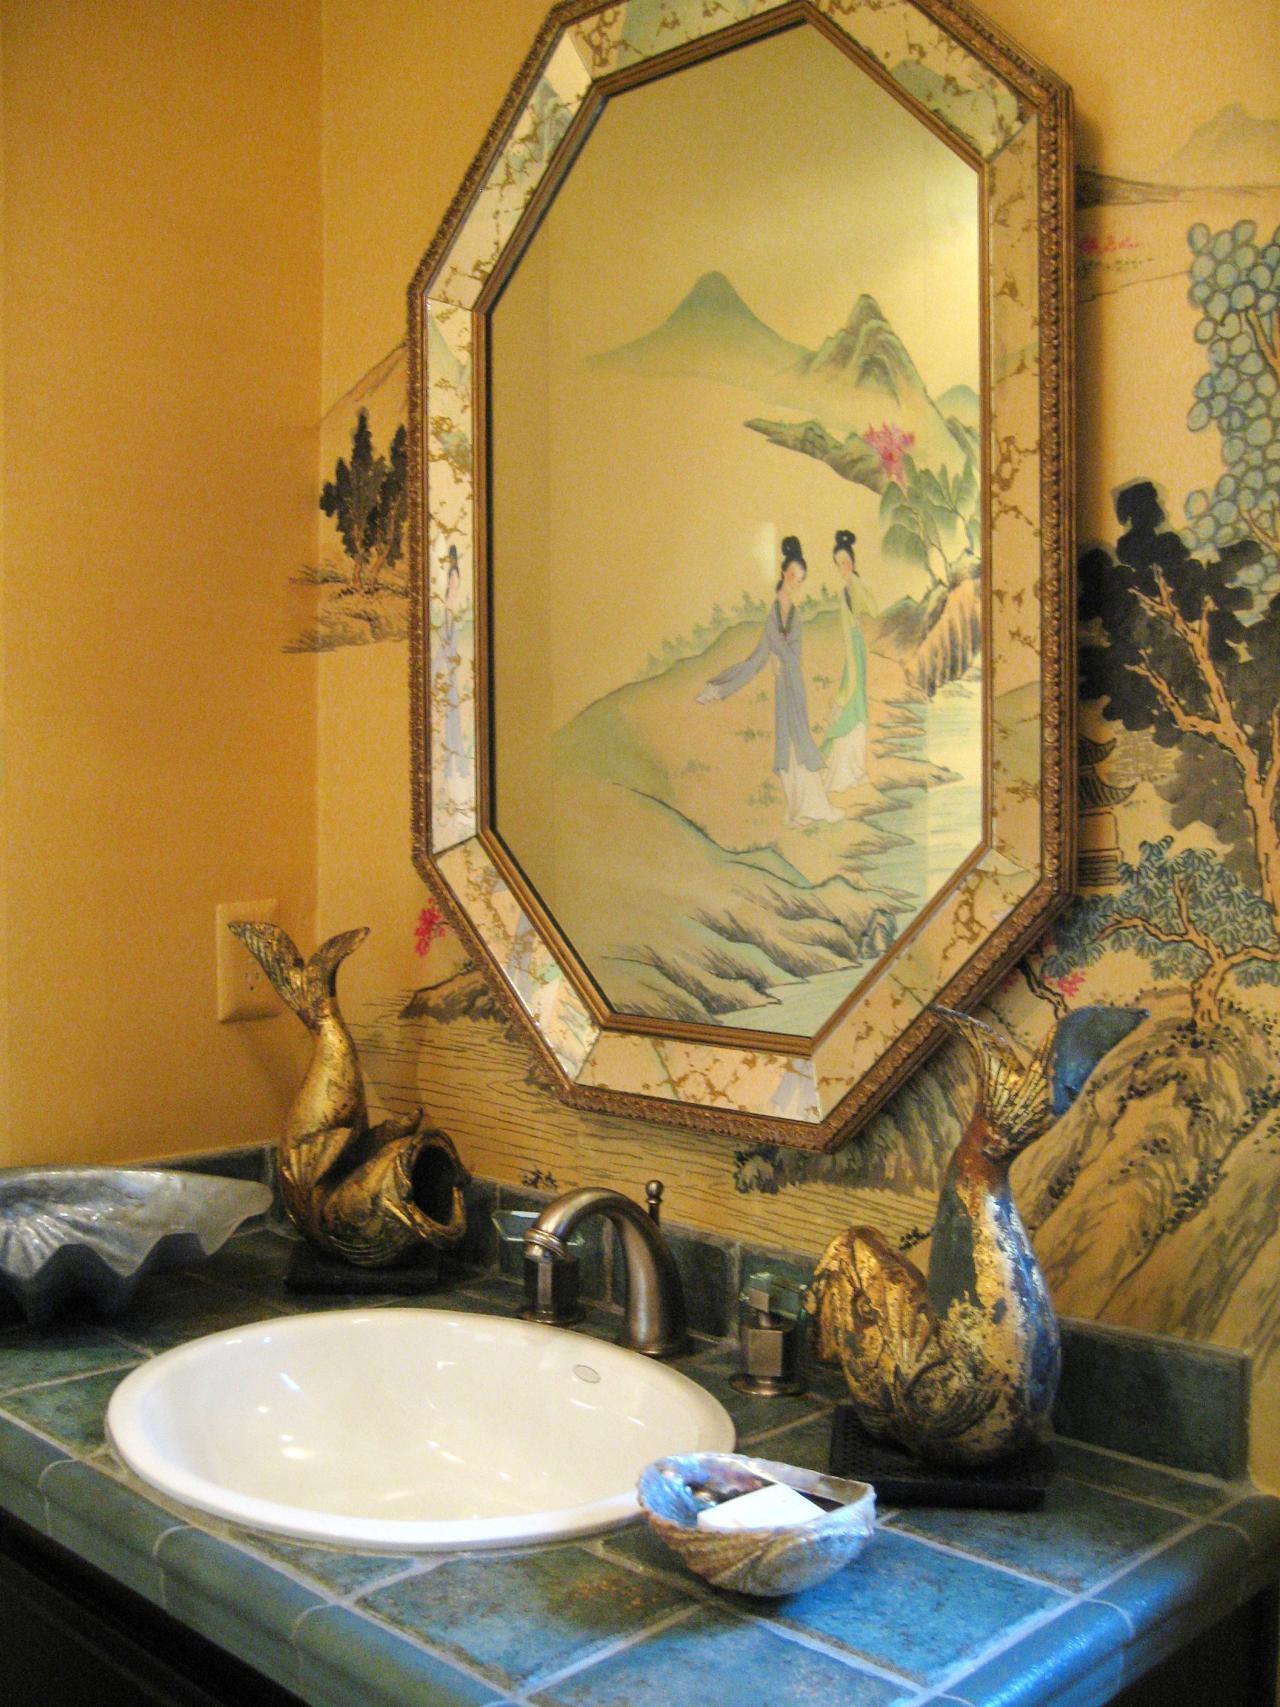 RMS_ladolfina-chinoiserie-powder-room-vanity_s3x4.jpg.rend.hgtvcom.1280.1707